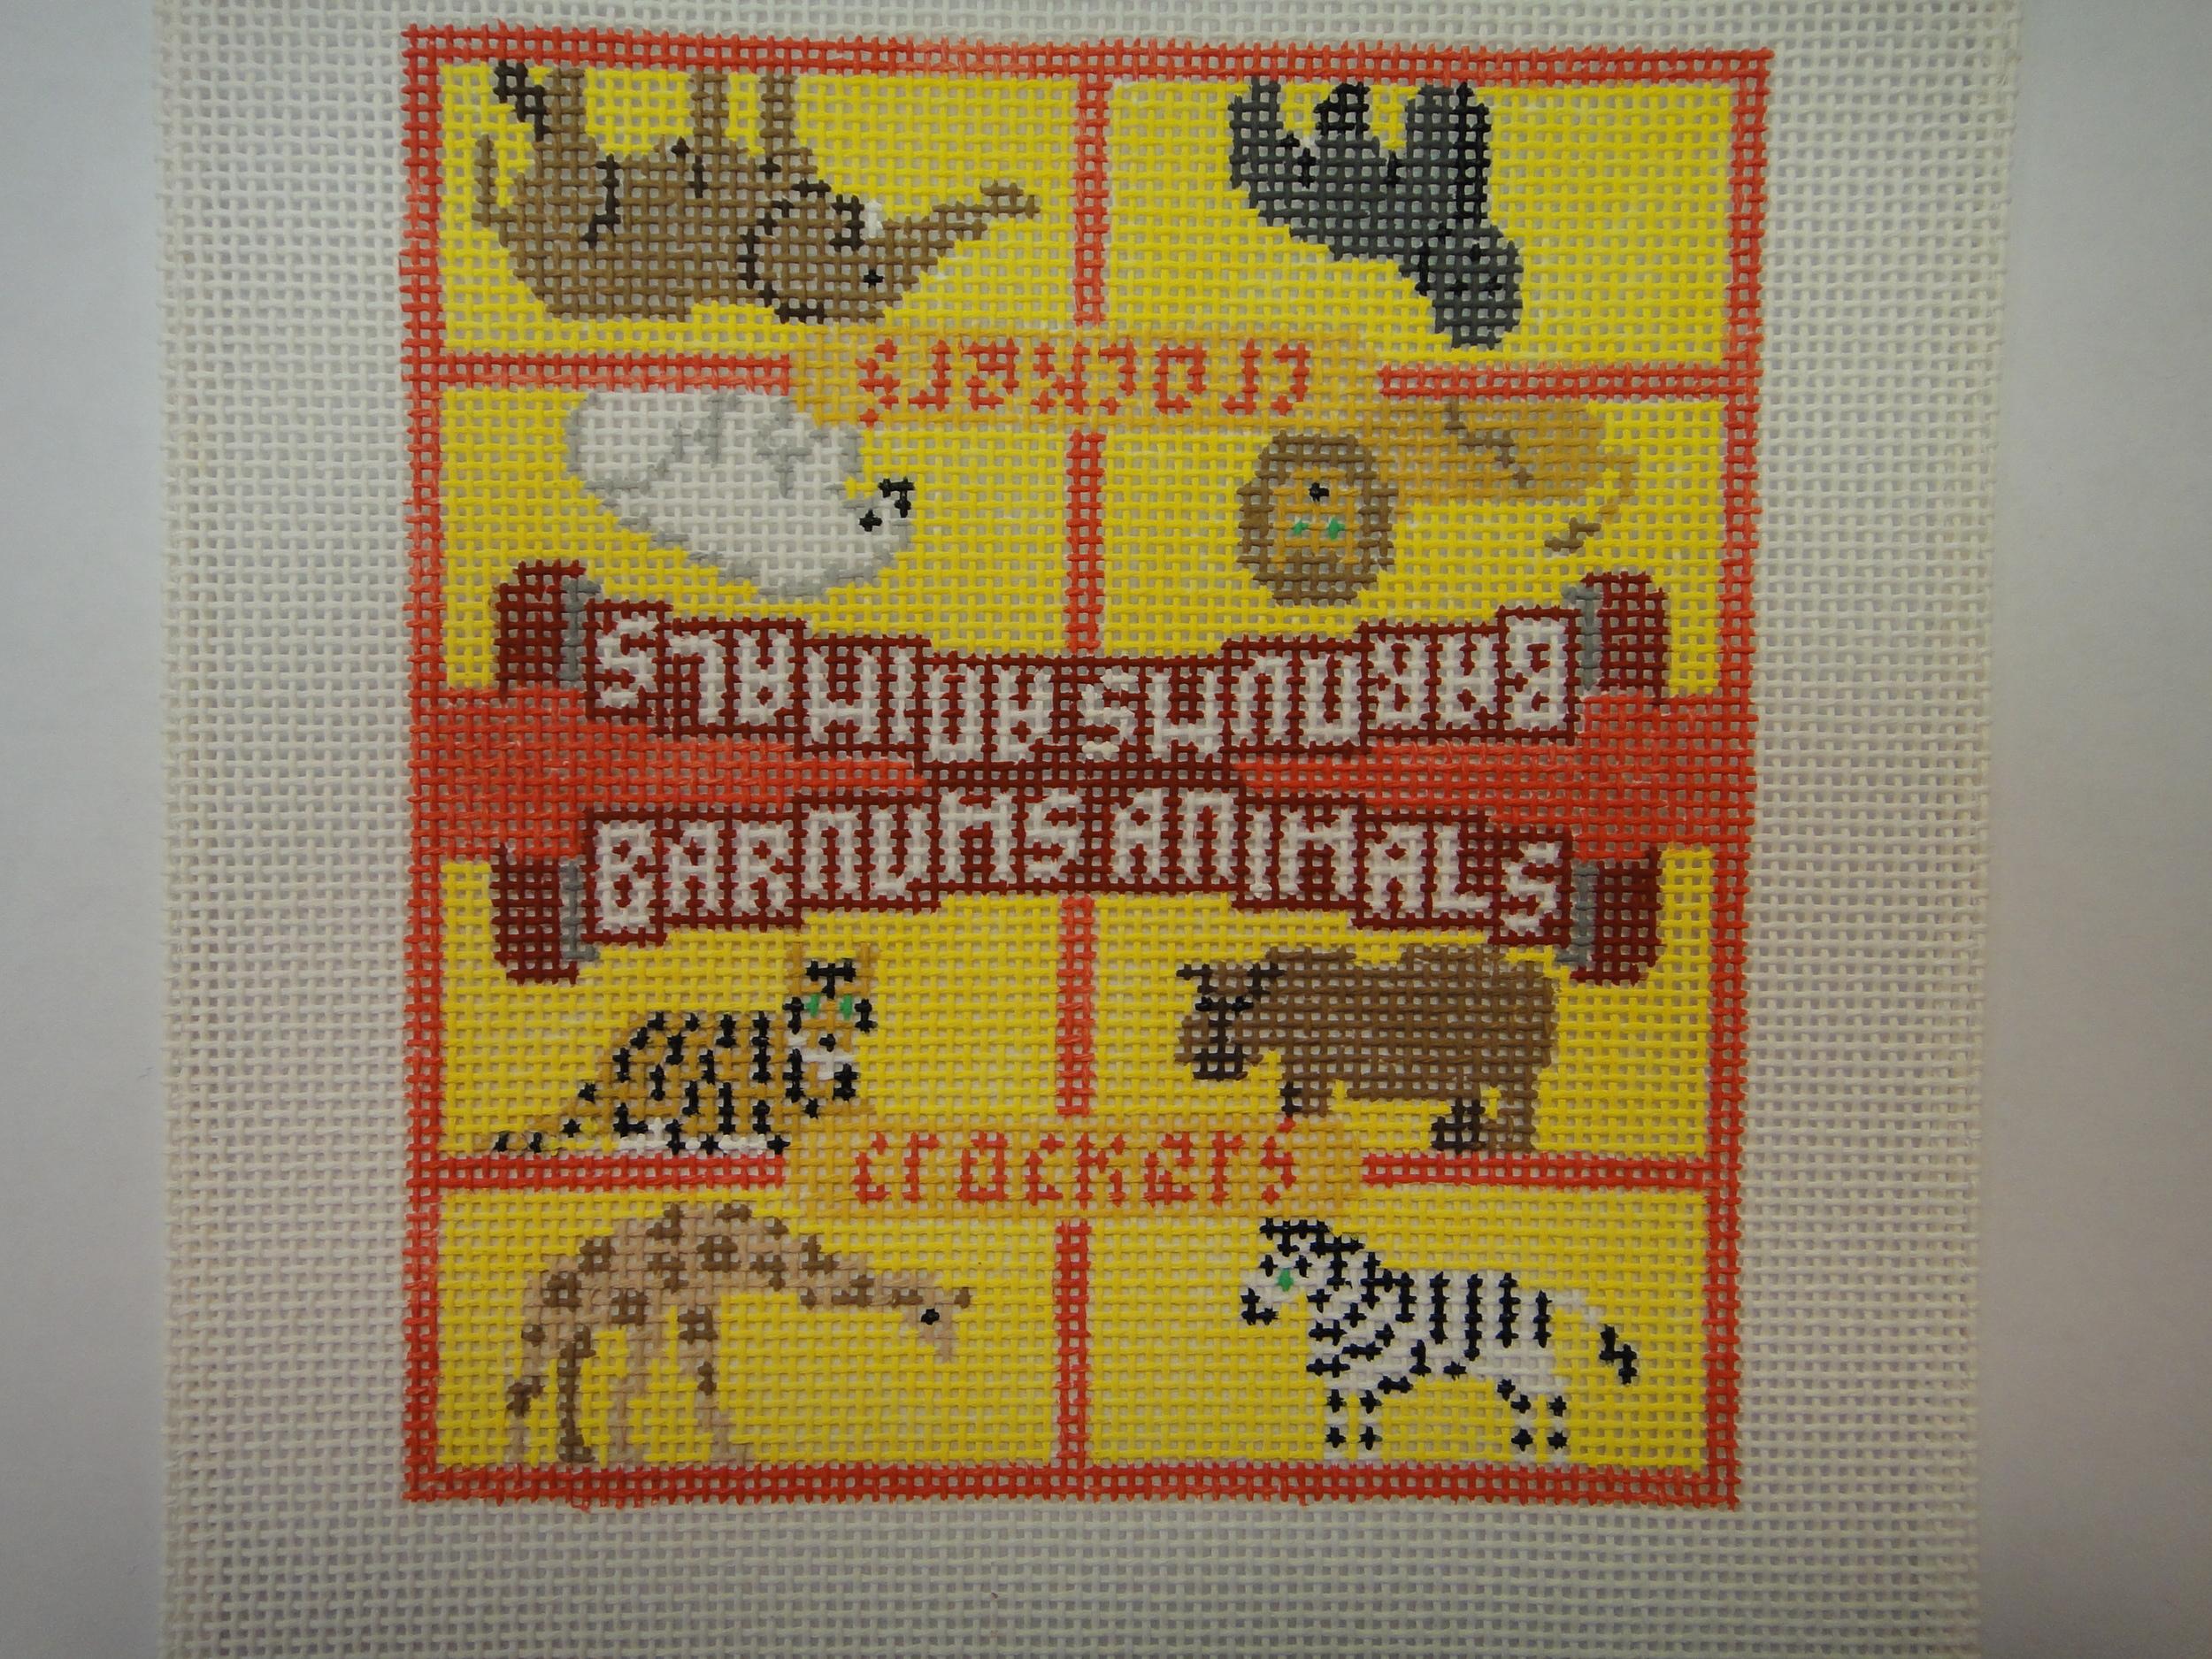 G48 Animal Crackers (6x6)